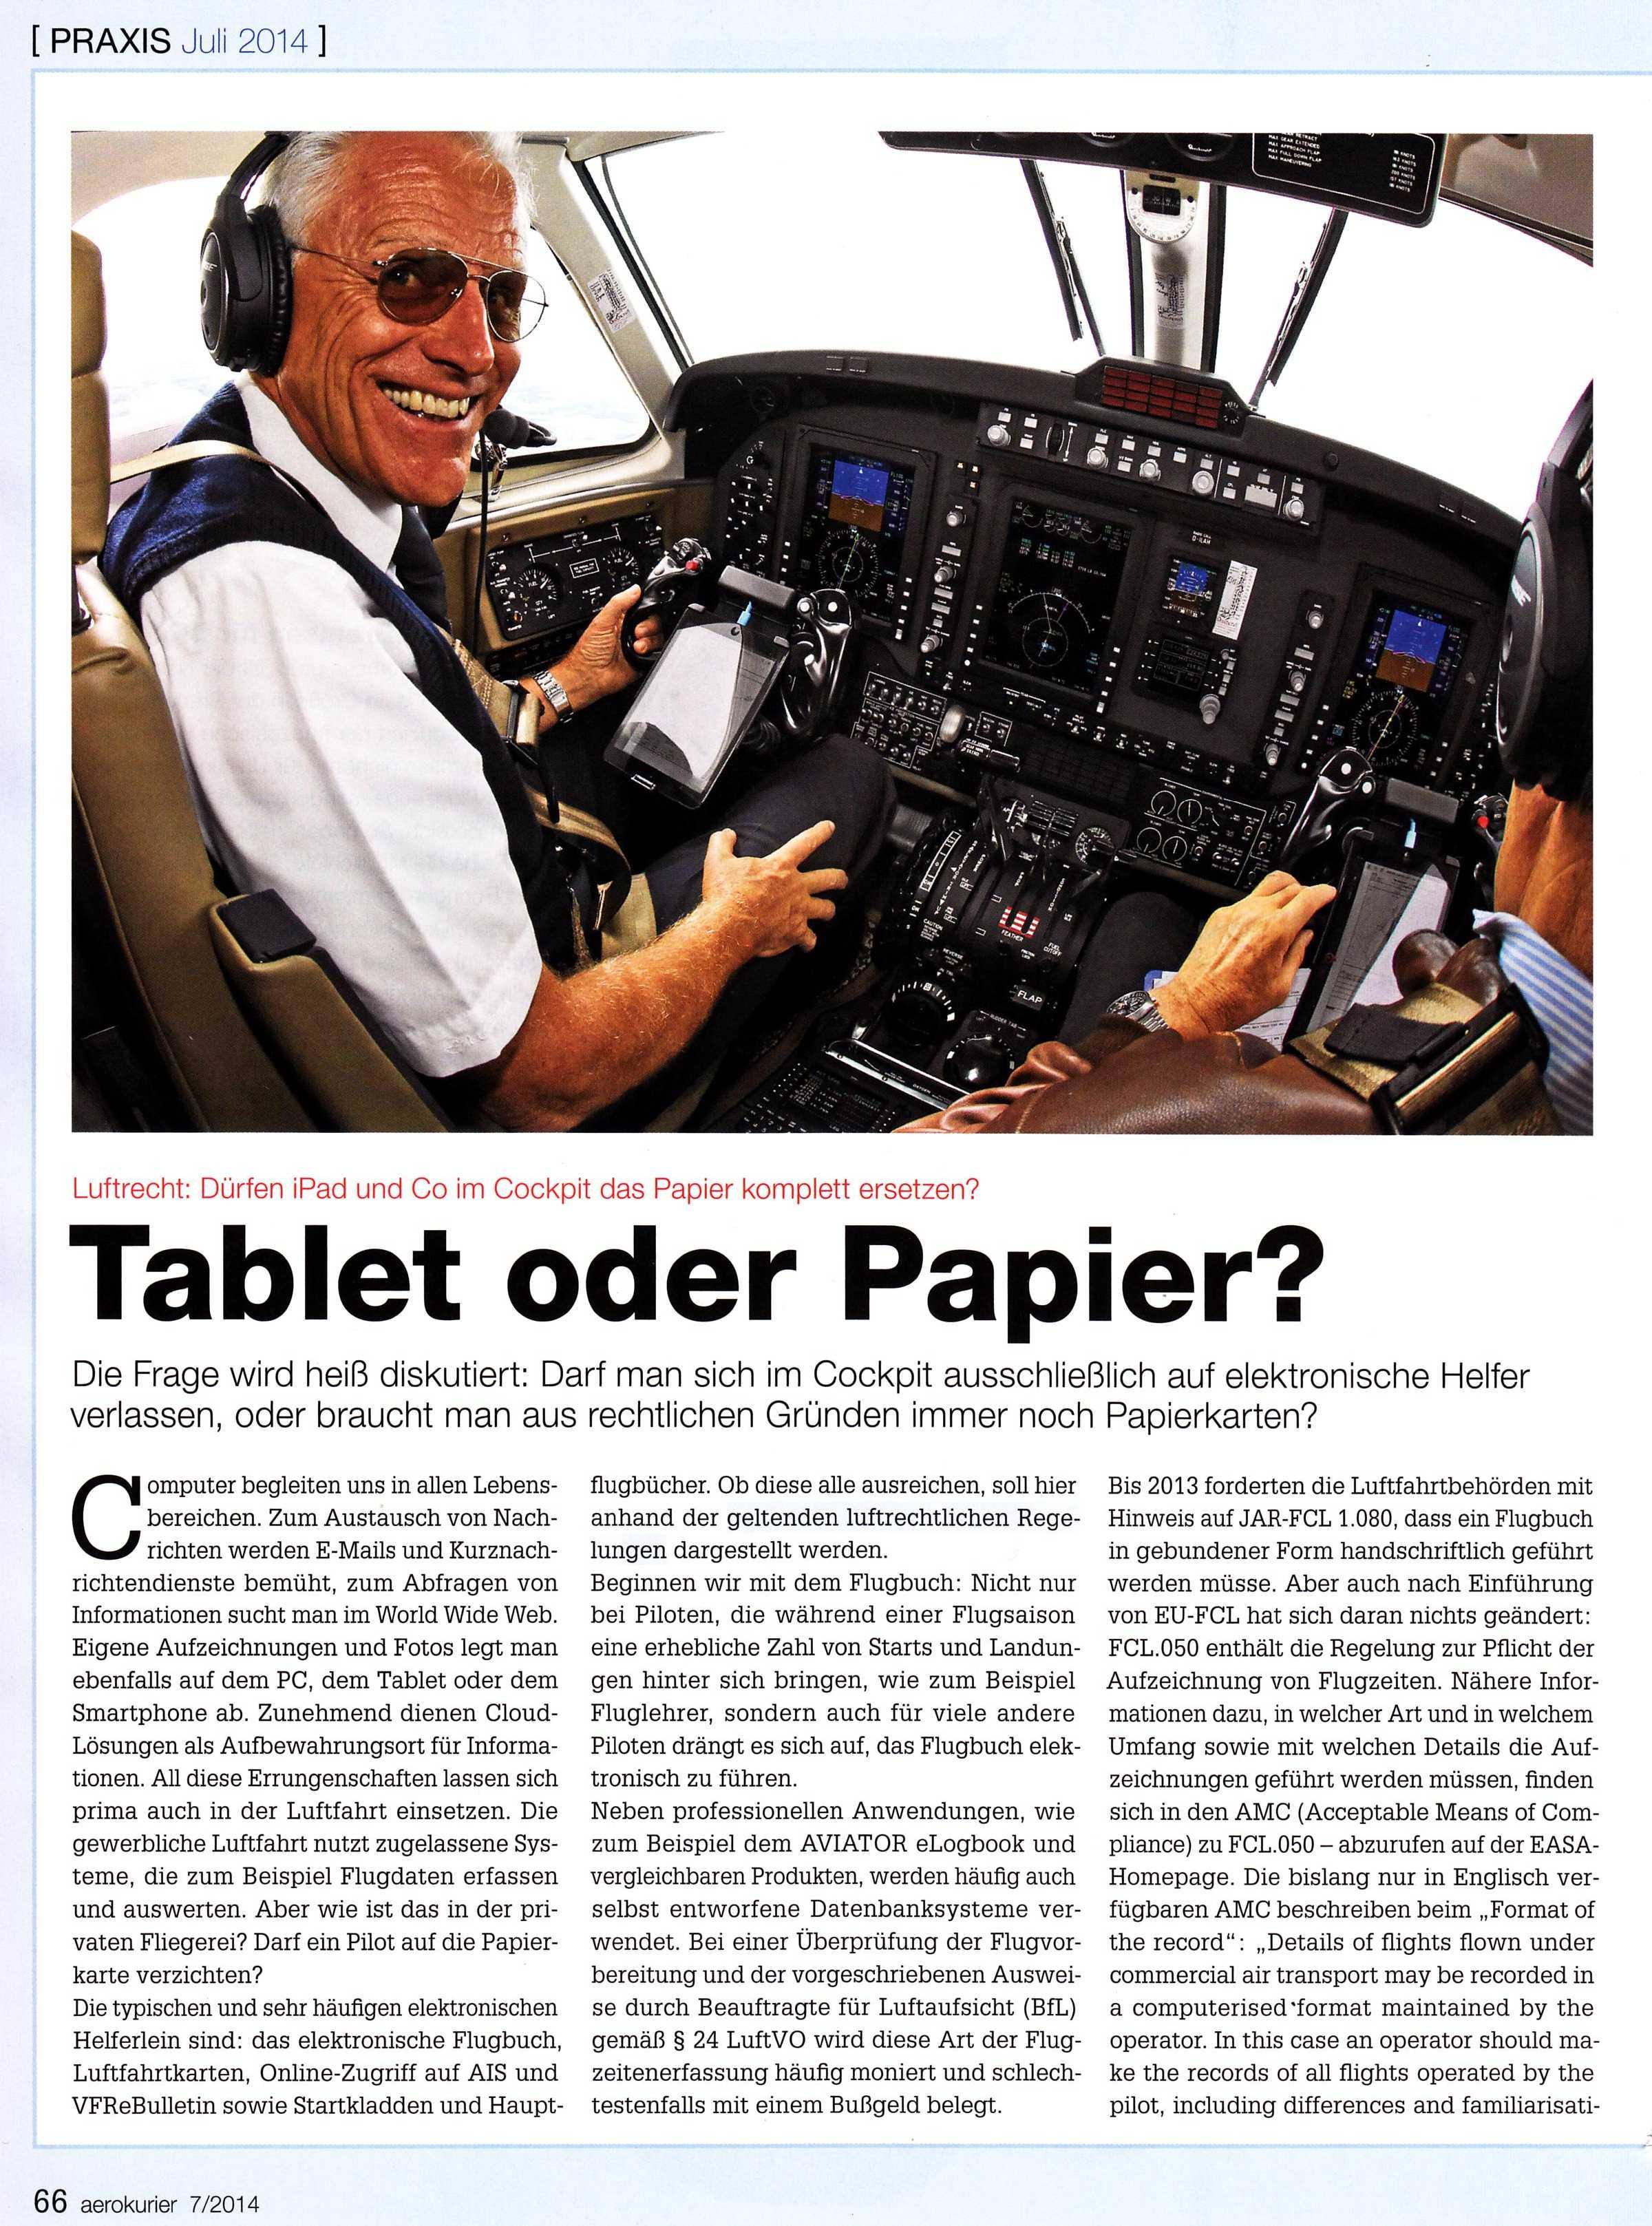 2014-07_Aerokurier-Tablet_oder _Papier_1